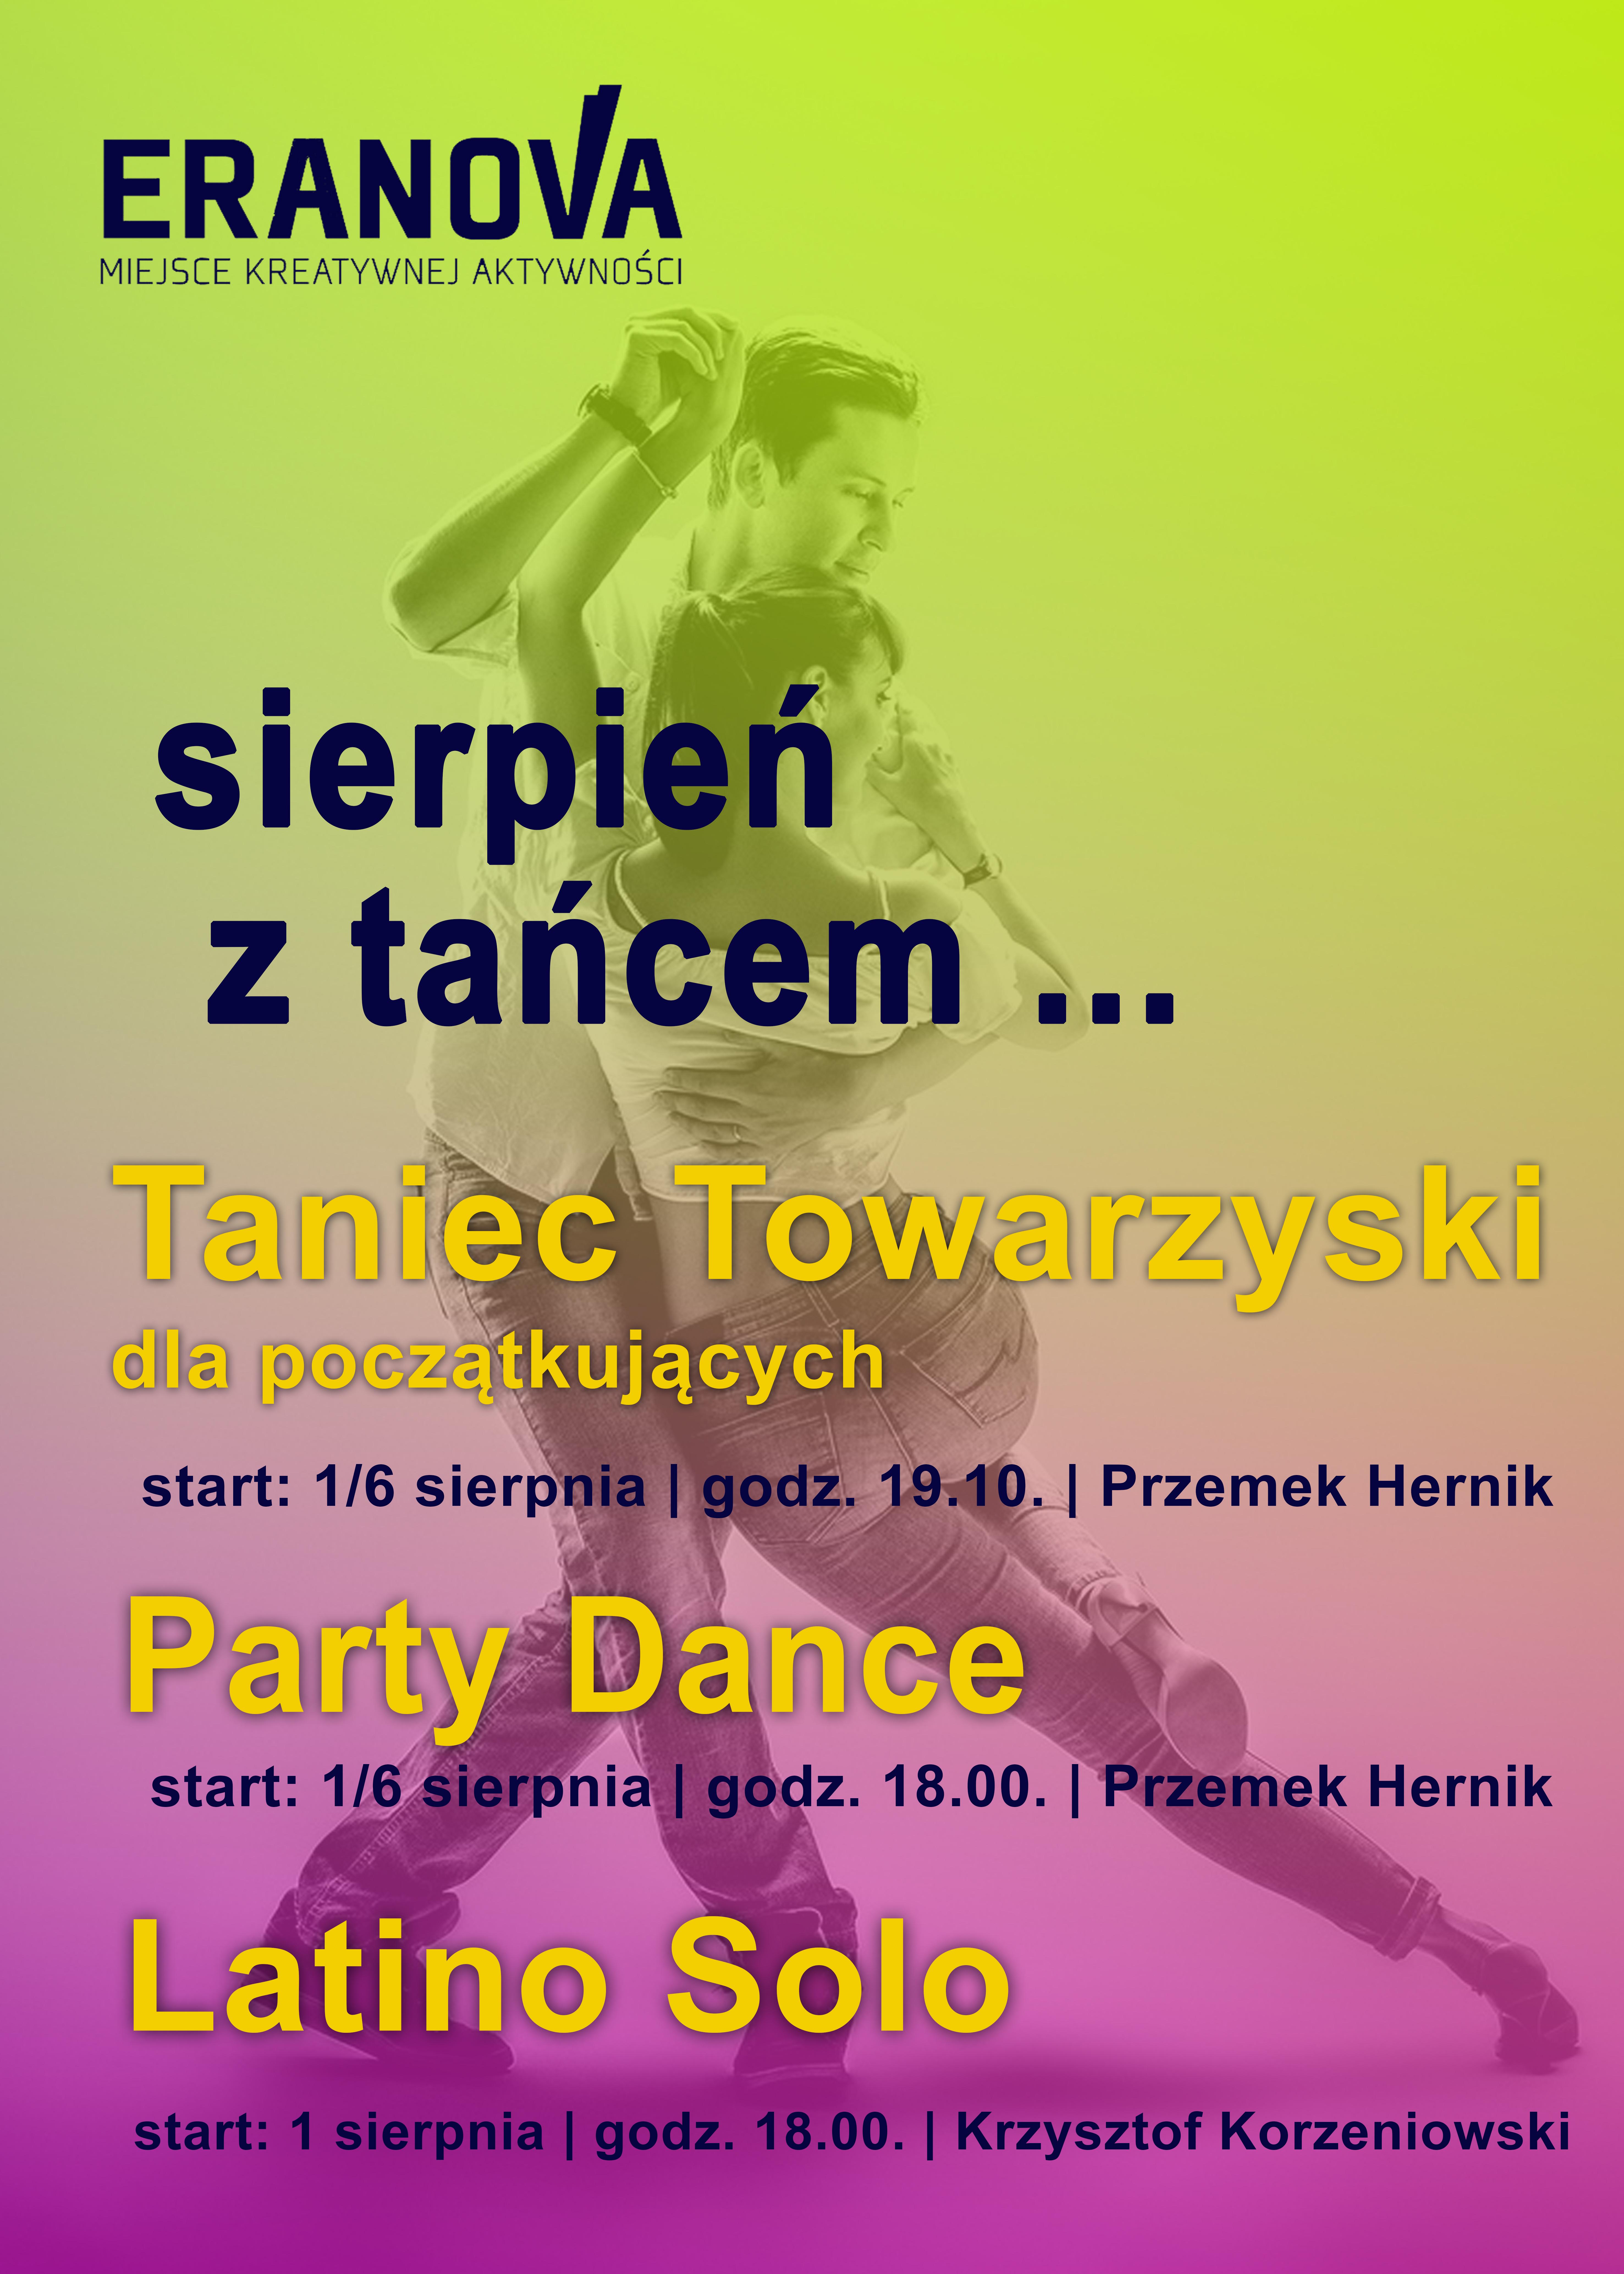 http://m.eranova.pl/2019/07/orig/zbiorczy-jesien-dorosli-3021.jpg